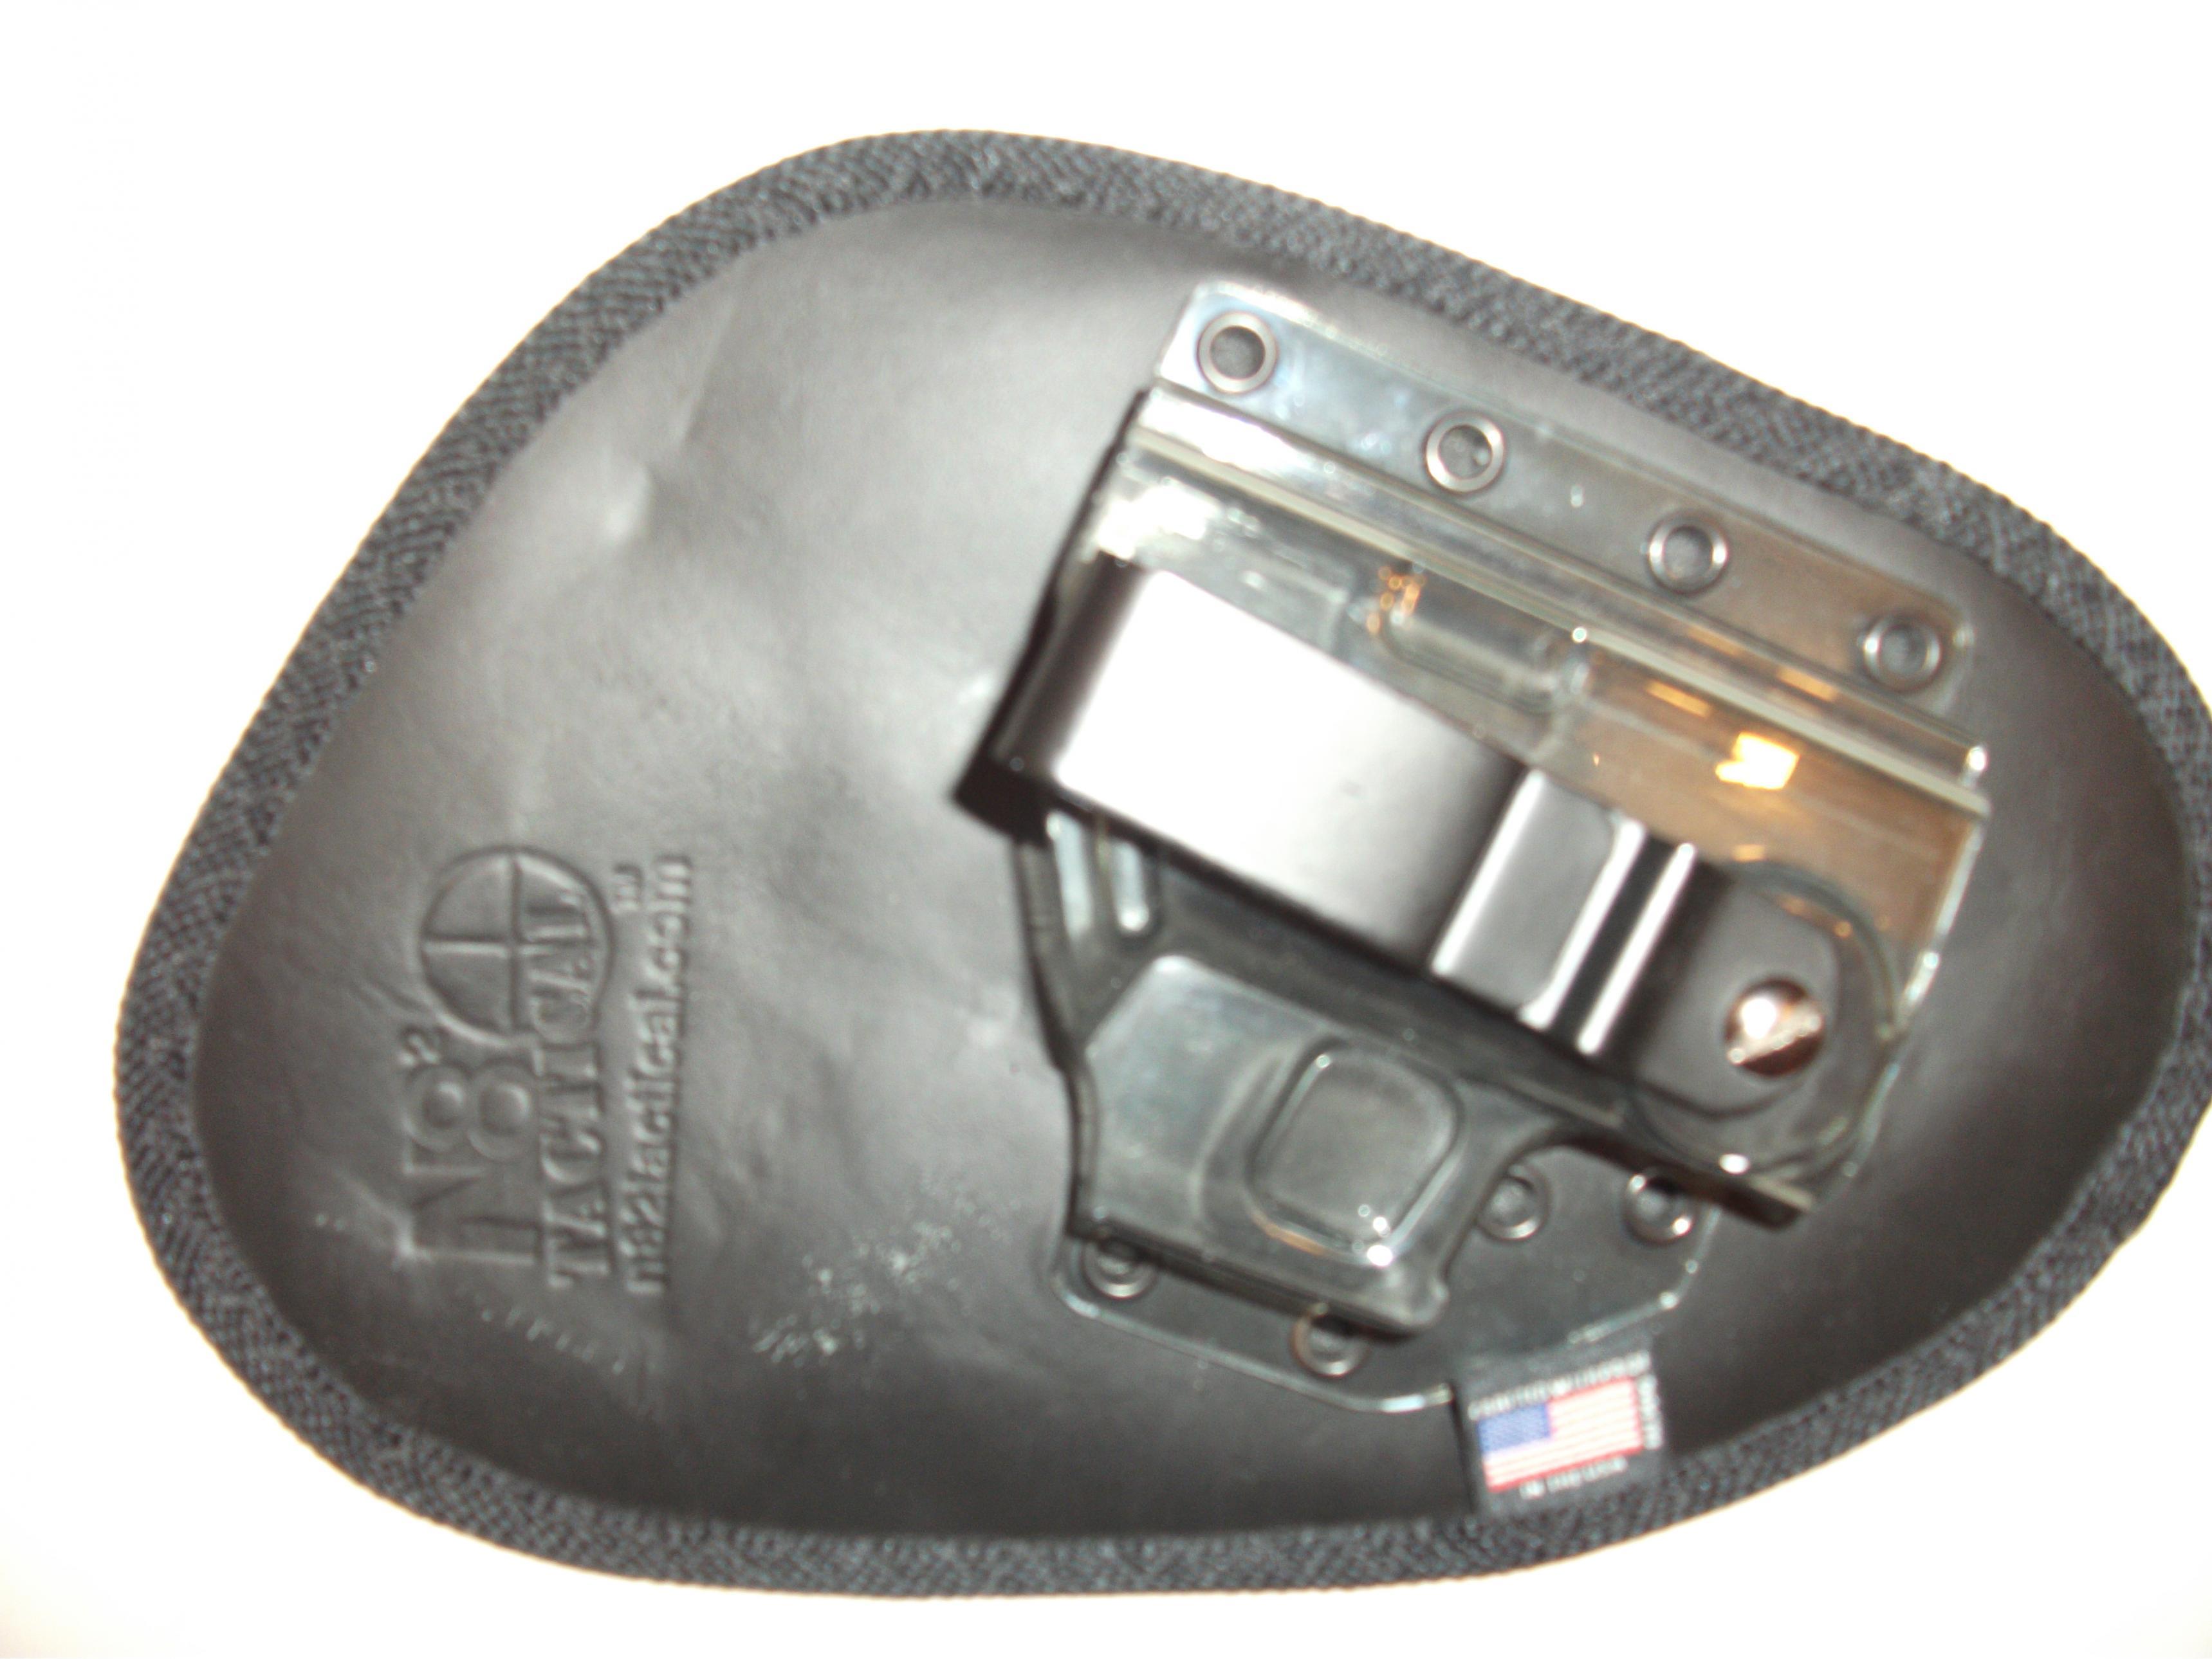 N82tactical professional for xdm 9mm-dscf1321.jpg